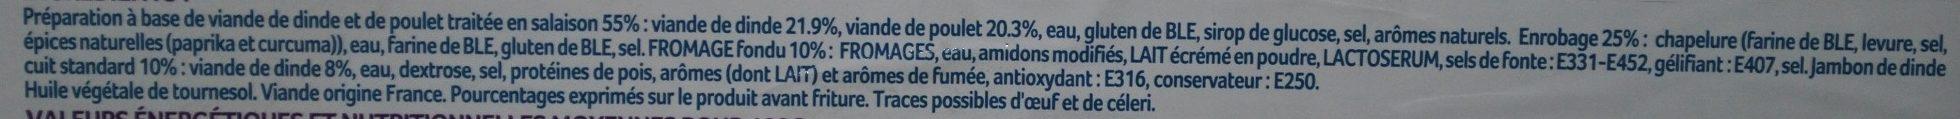 Cordons Bleus de Dinde - Ingrediënten